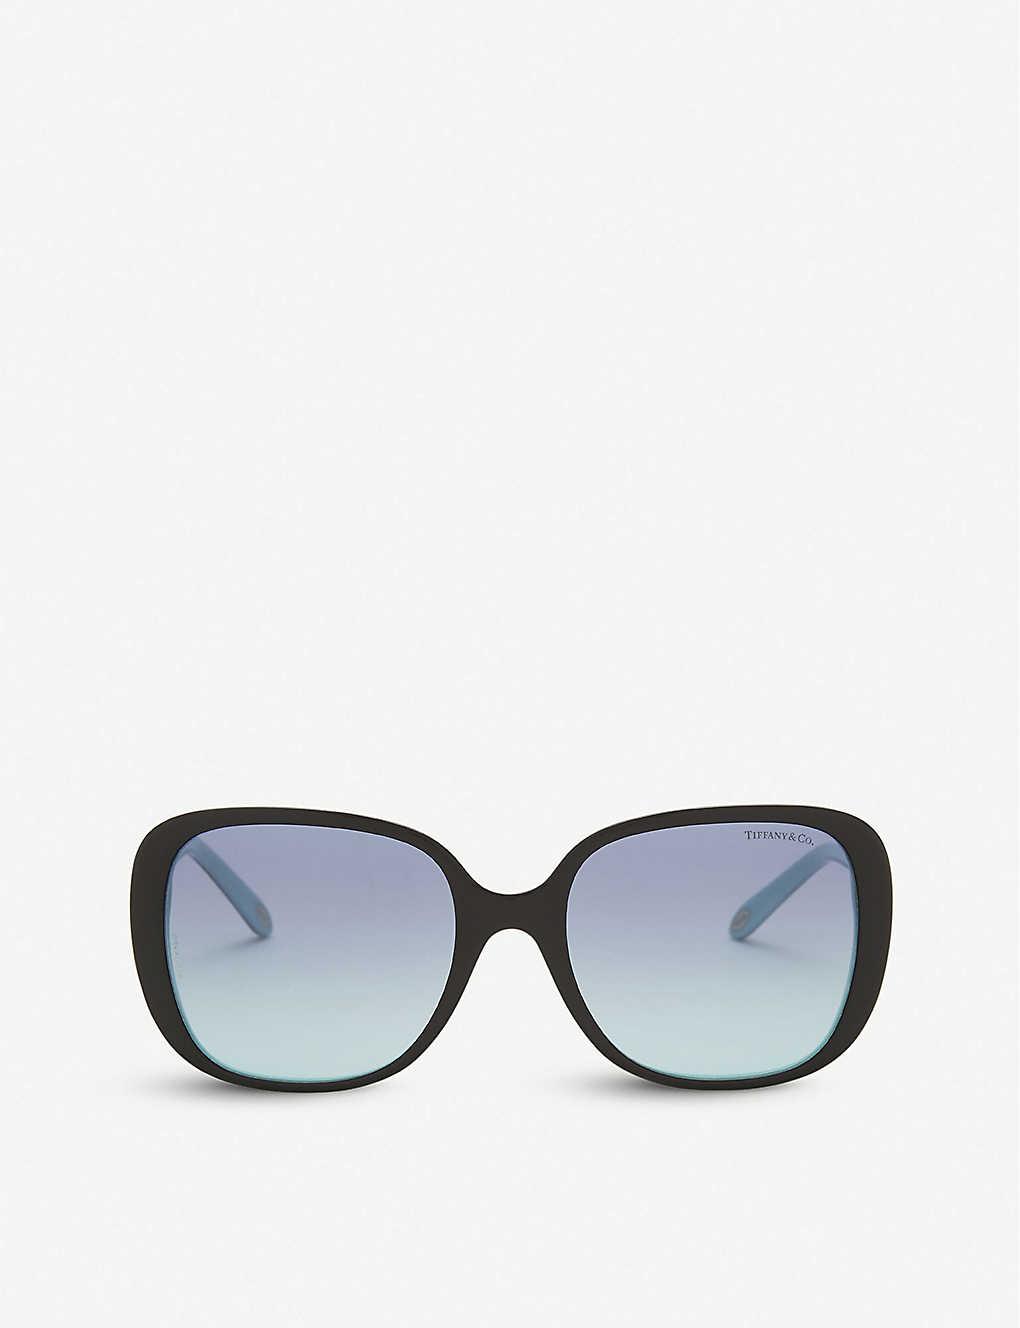 2eccfb3cd7cd TIFFANY & CO - Tf4137 square-frame sunglasses | Selfridges.com